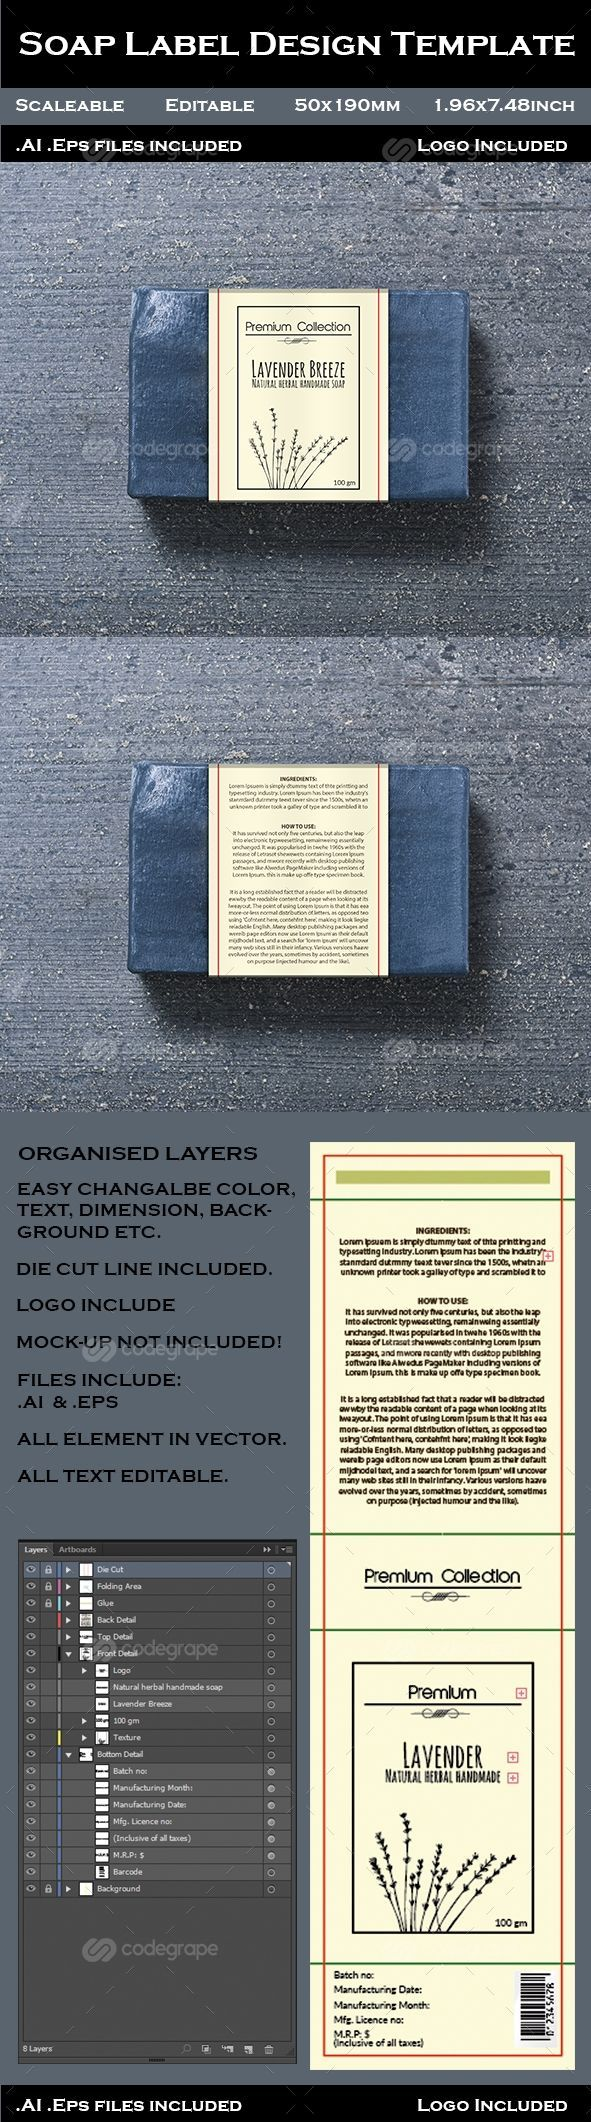 Soap Label Design Template on @codegrape. More Info: https://www.codegrape.com/item/soap-label-design-template/10666